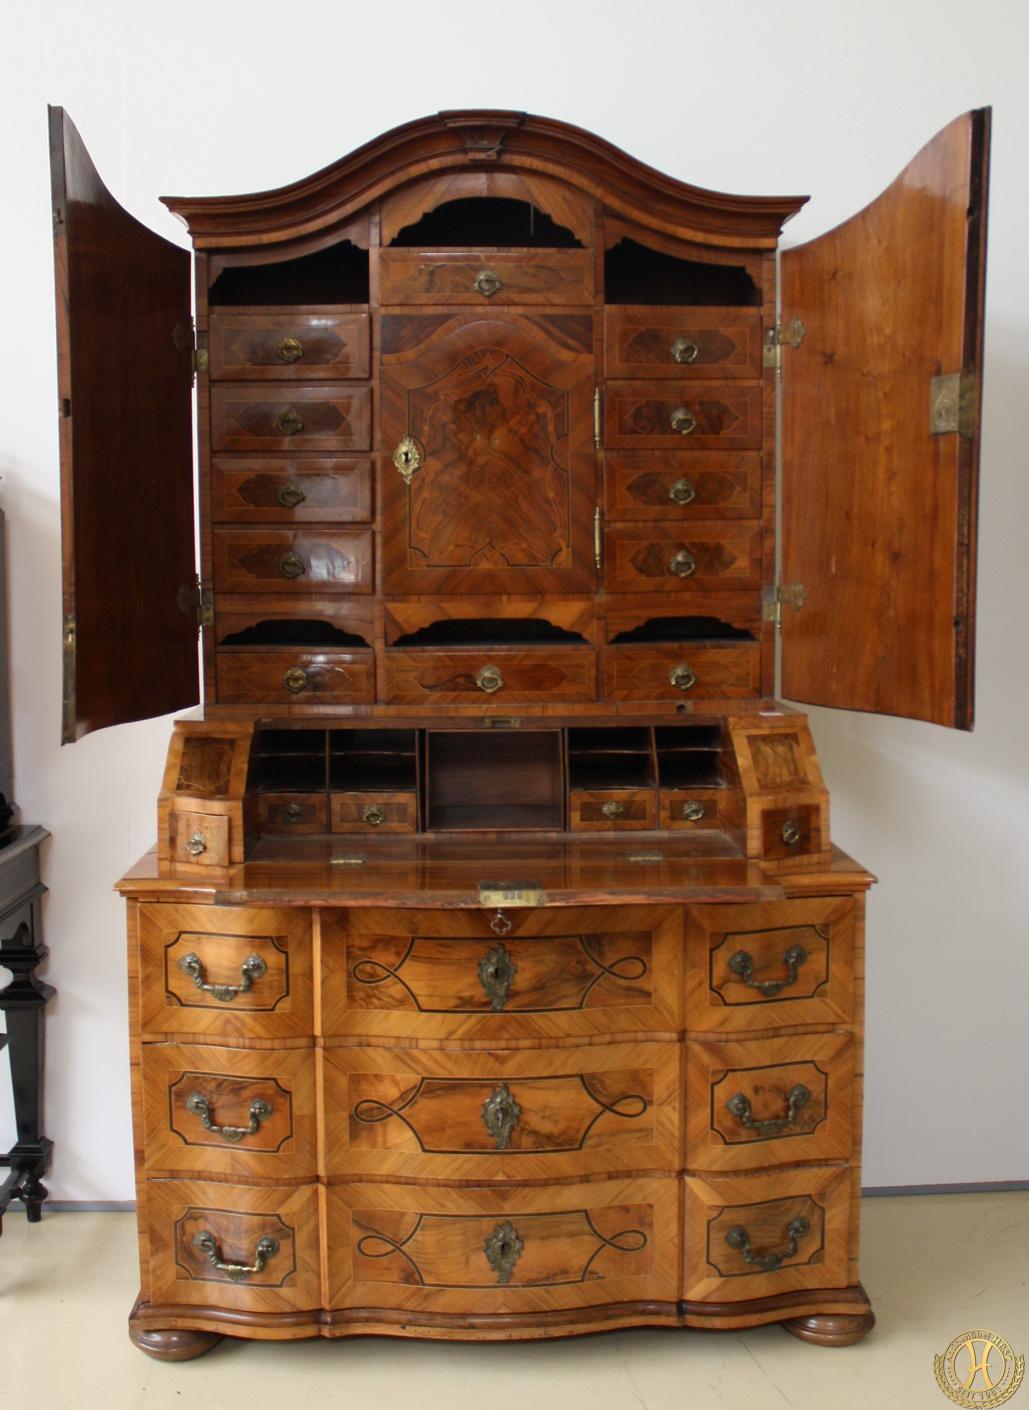 Barocker Schreibschrank 18. Jhdt. Antik Möbel Hesz